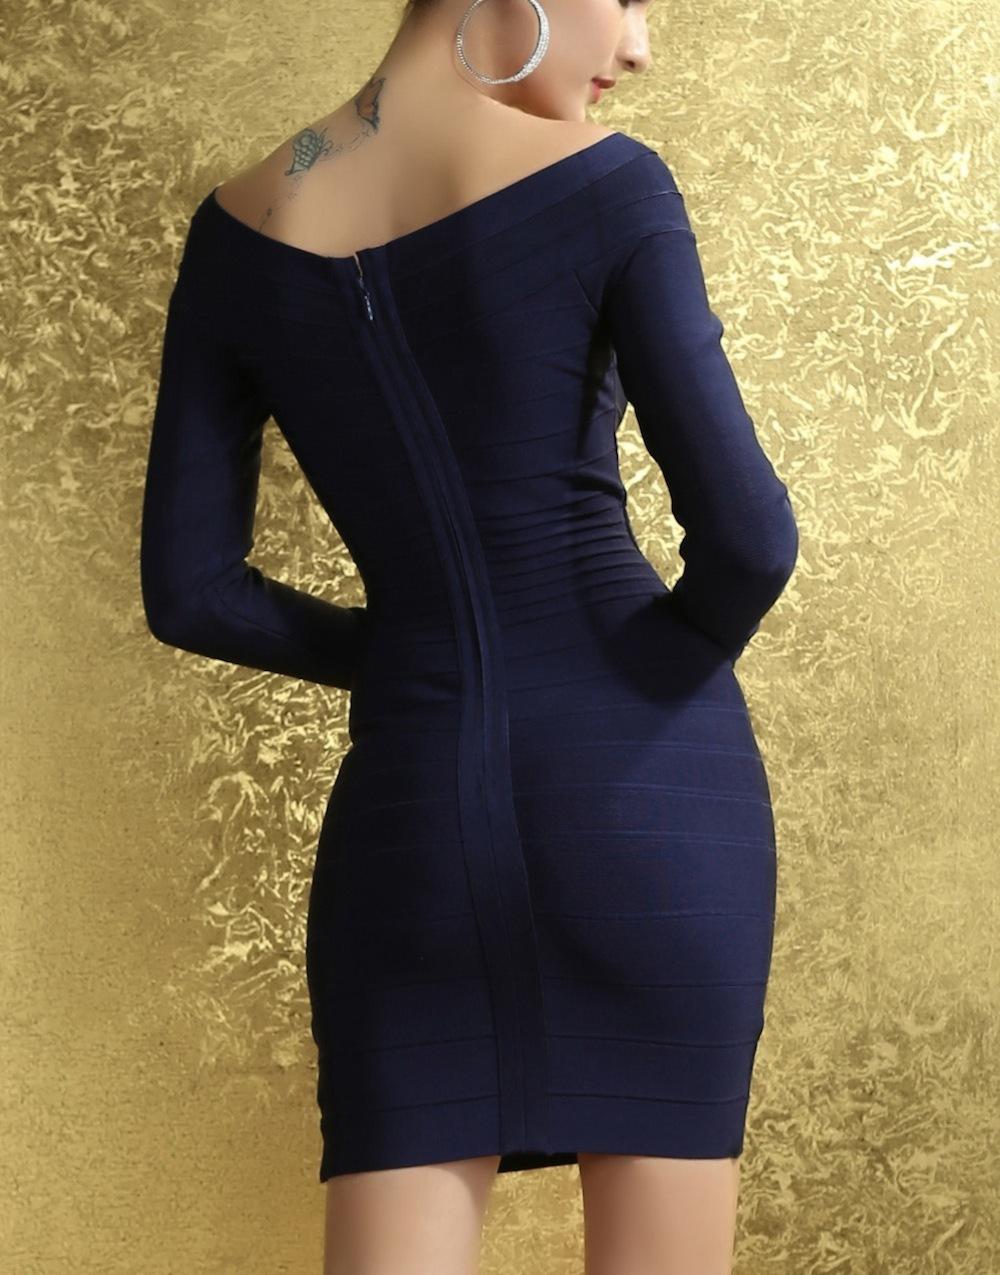 Royal Blue Off the Shoulder Long Sleeve Celeb Inspired Bandage Dress